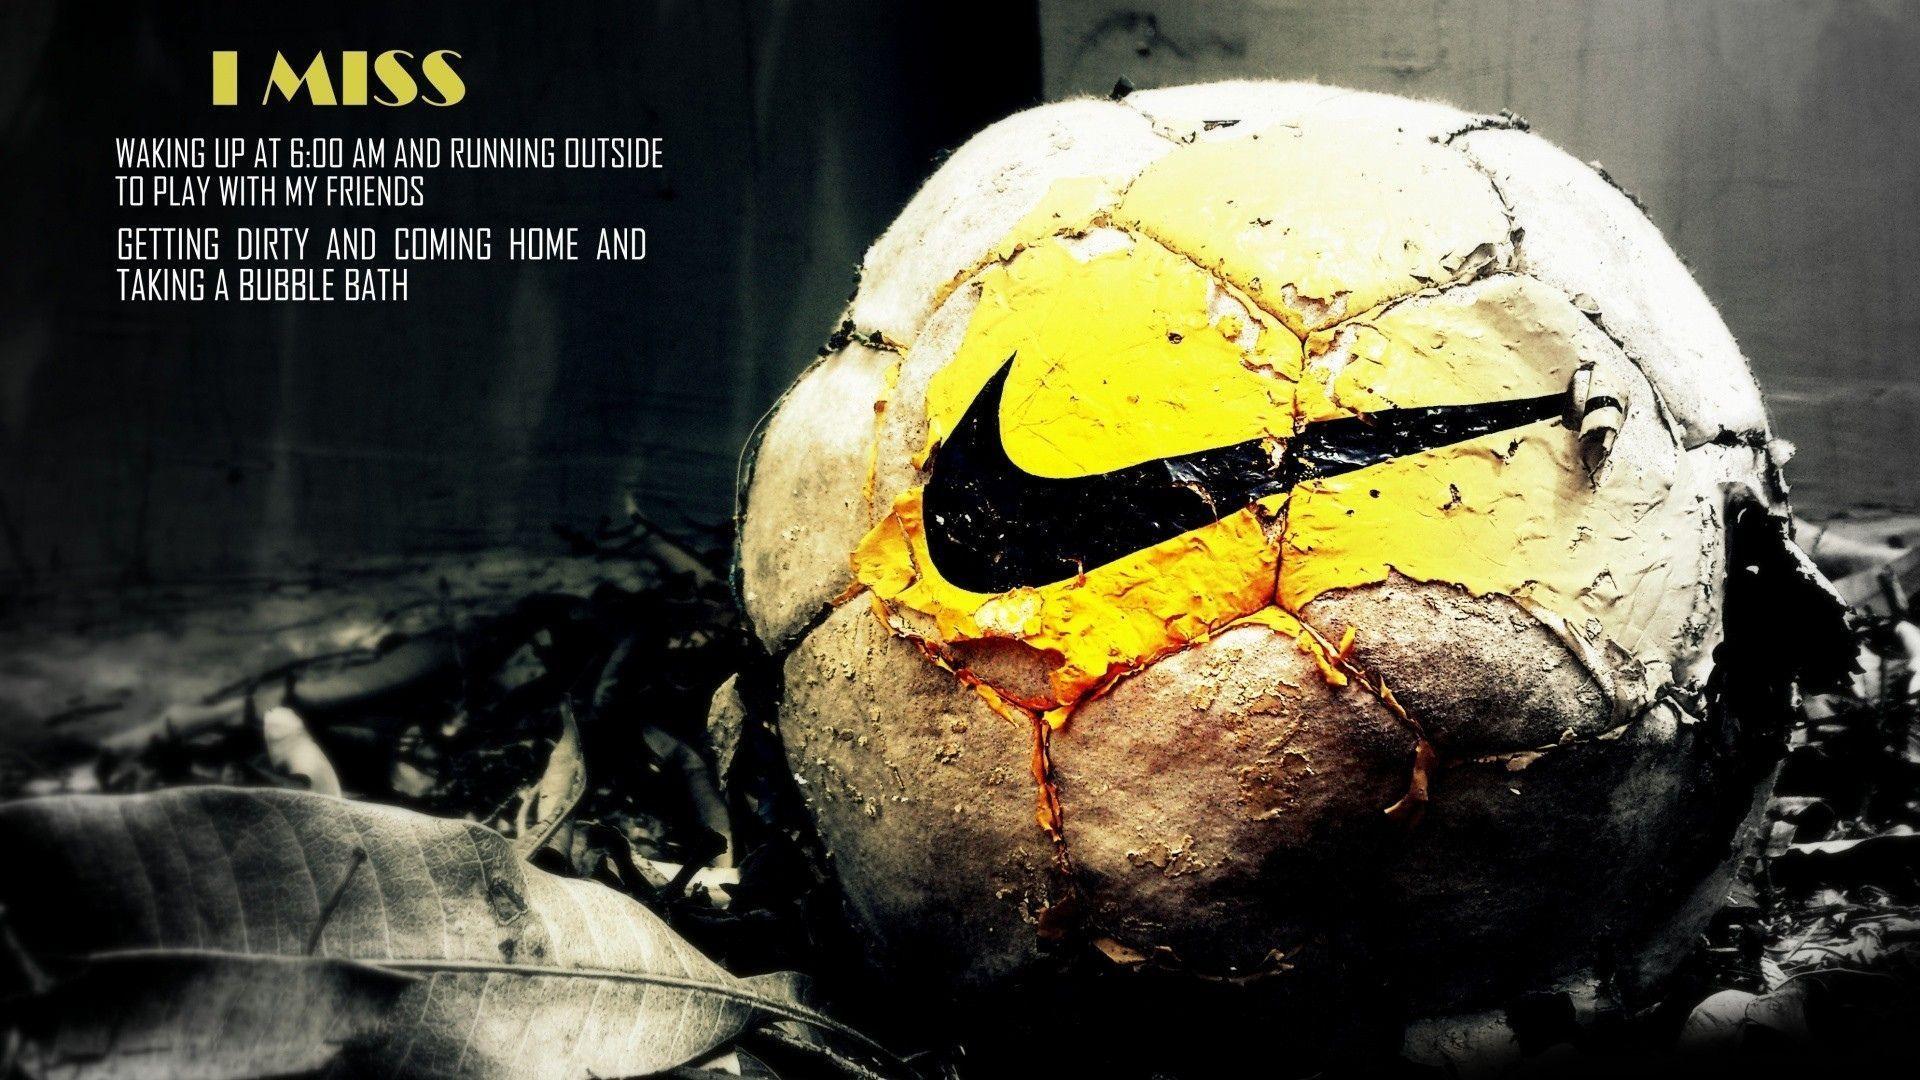 Soccer Nike Saying Wallpapers on WallpaperDog 1920x1080